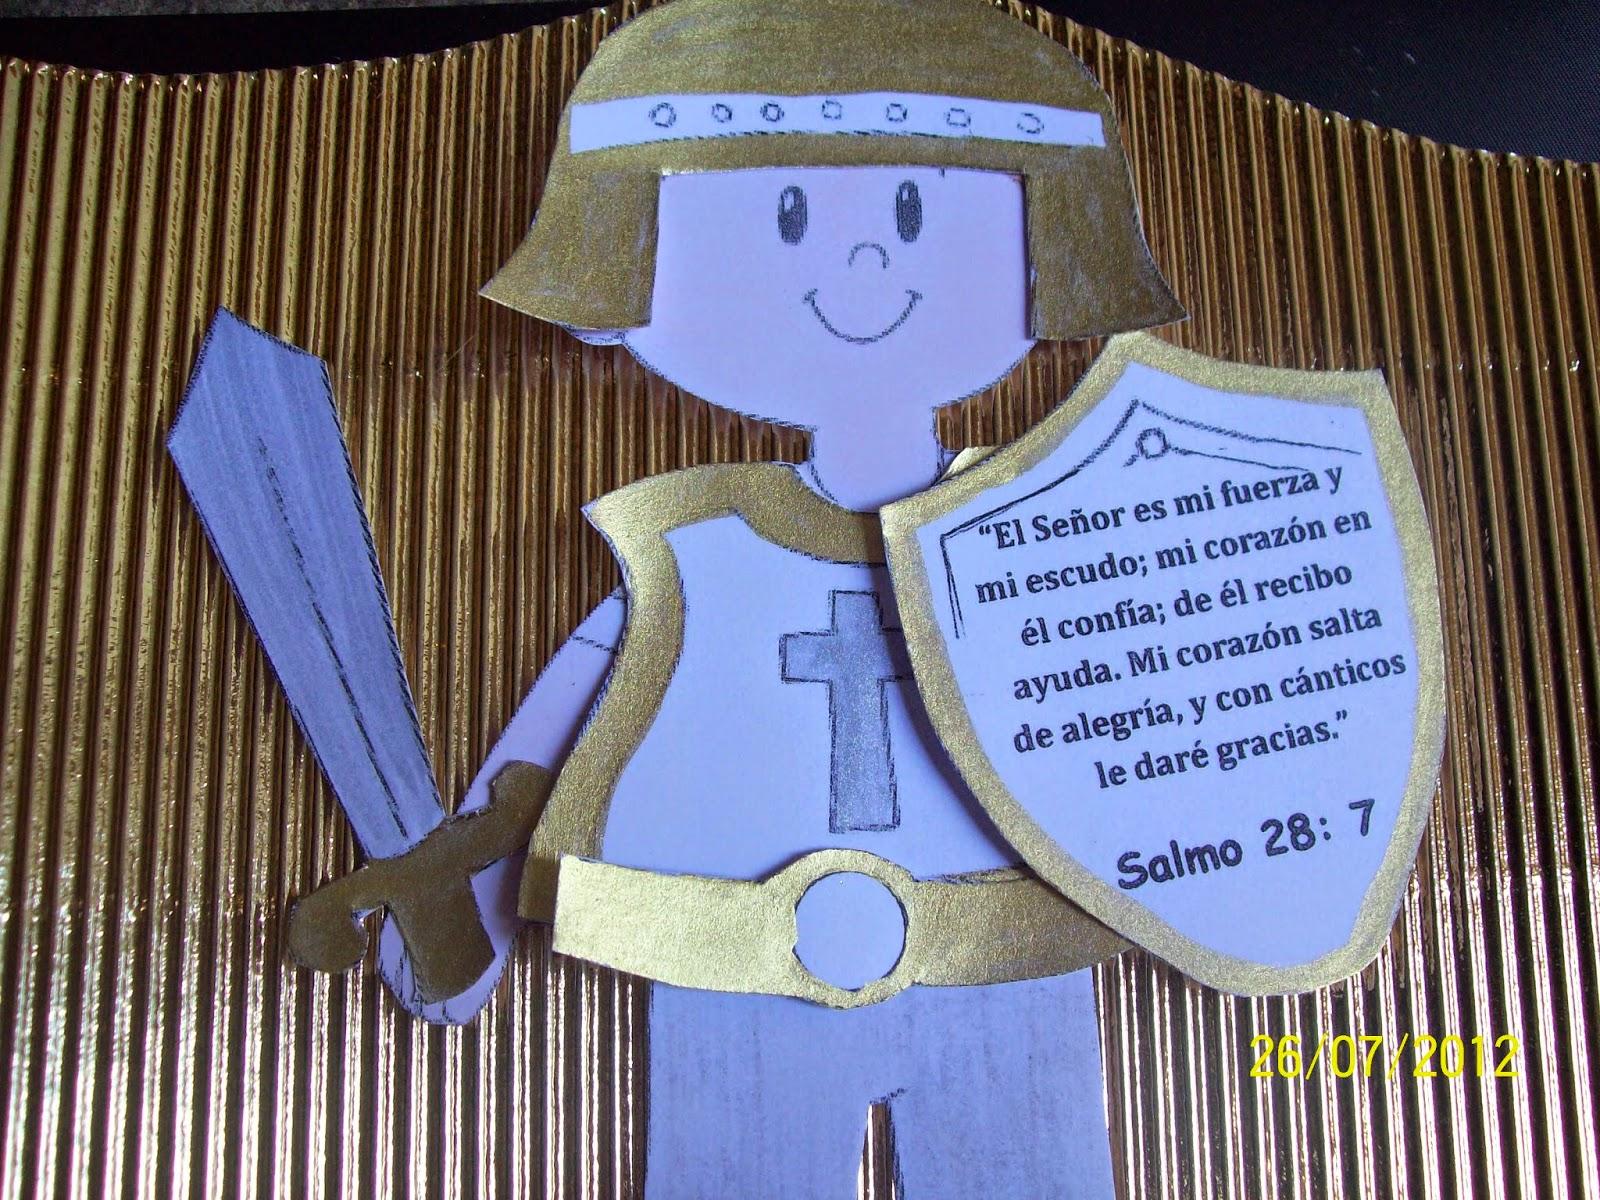 Escudo Manualidades De La Armadura Dios Wwwmiifotoscom